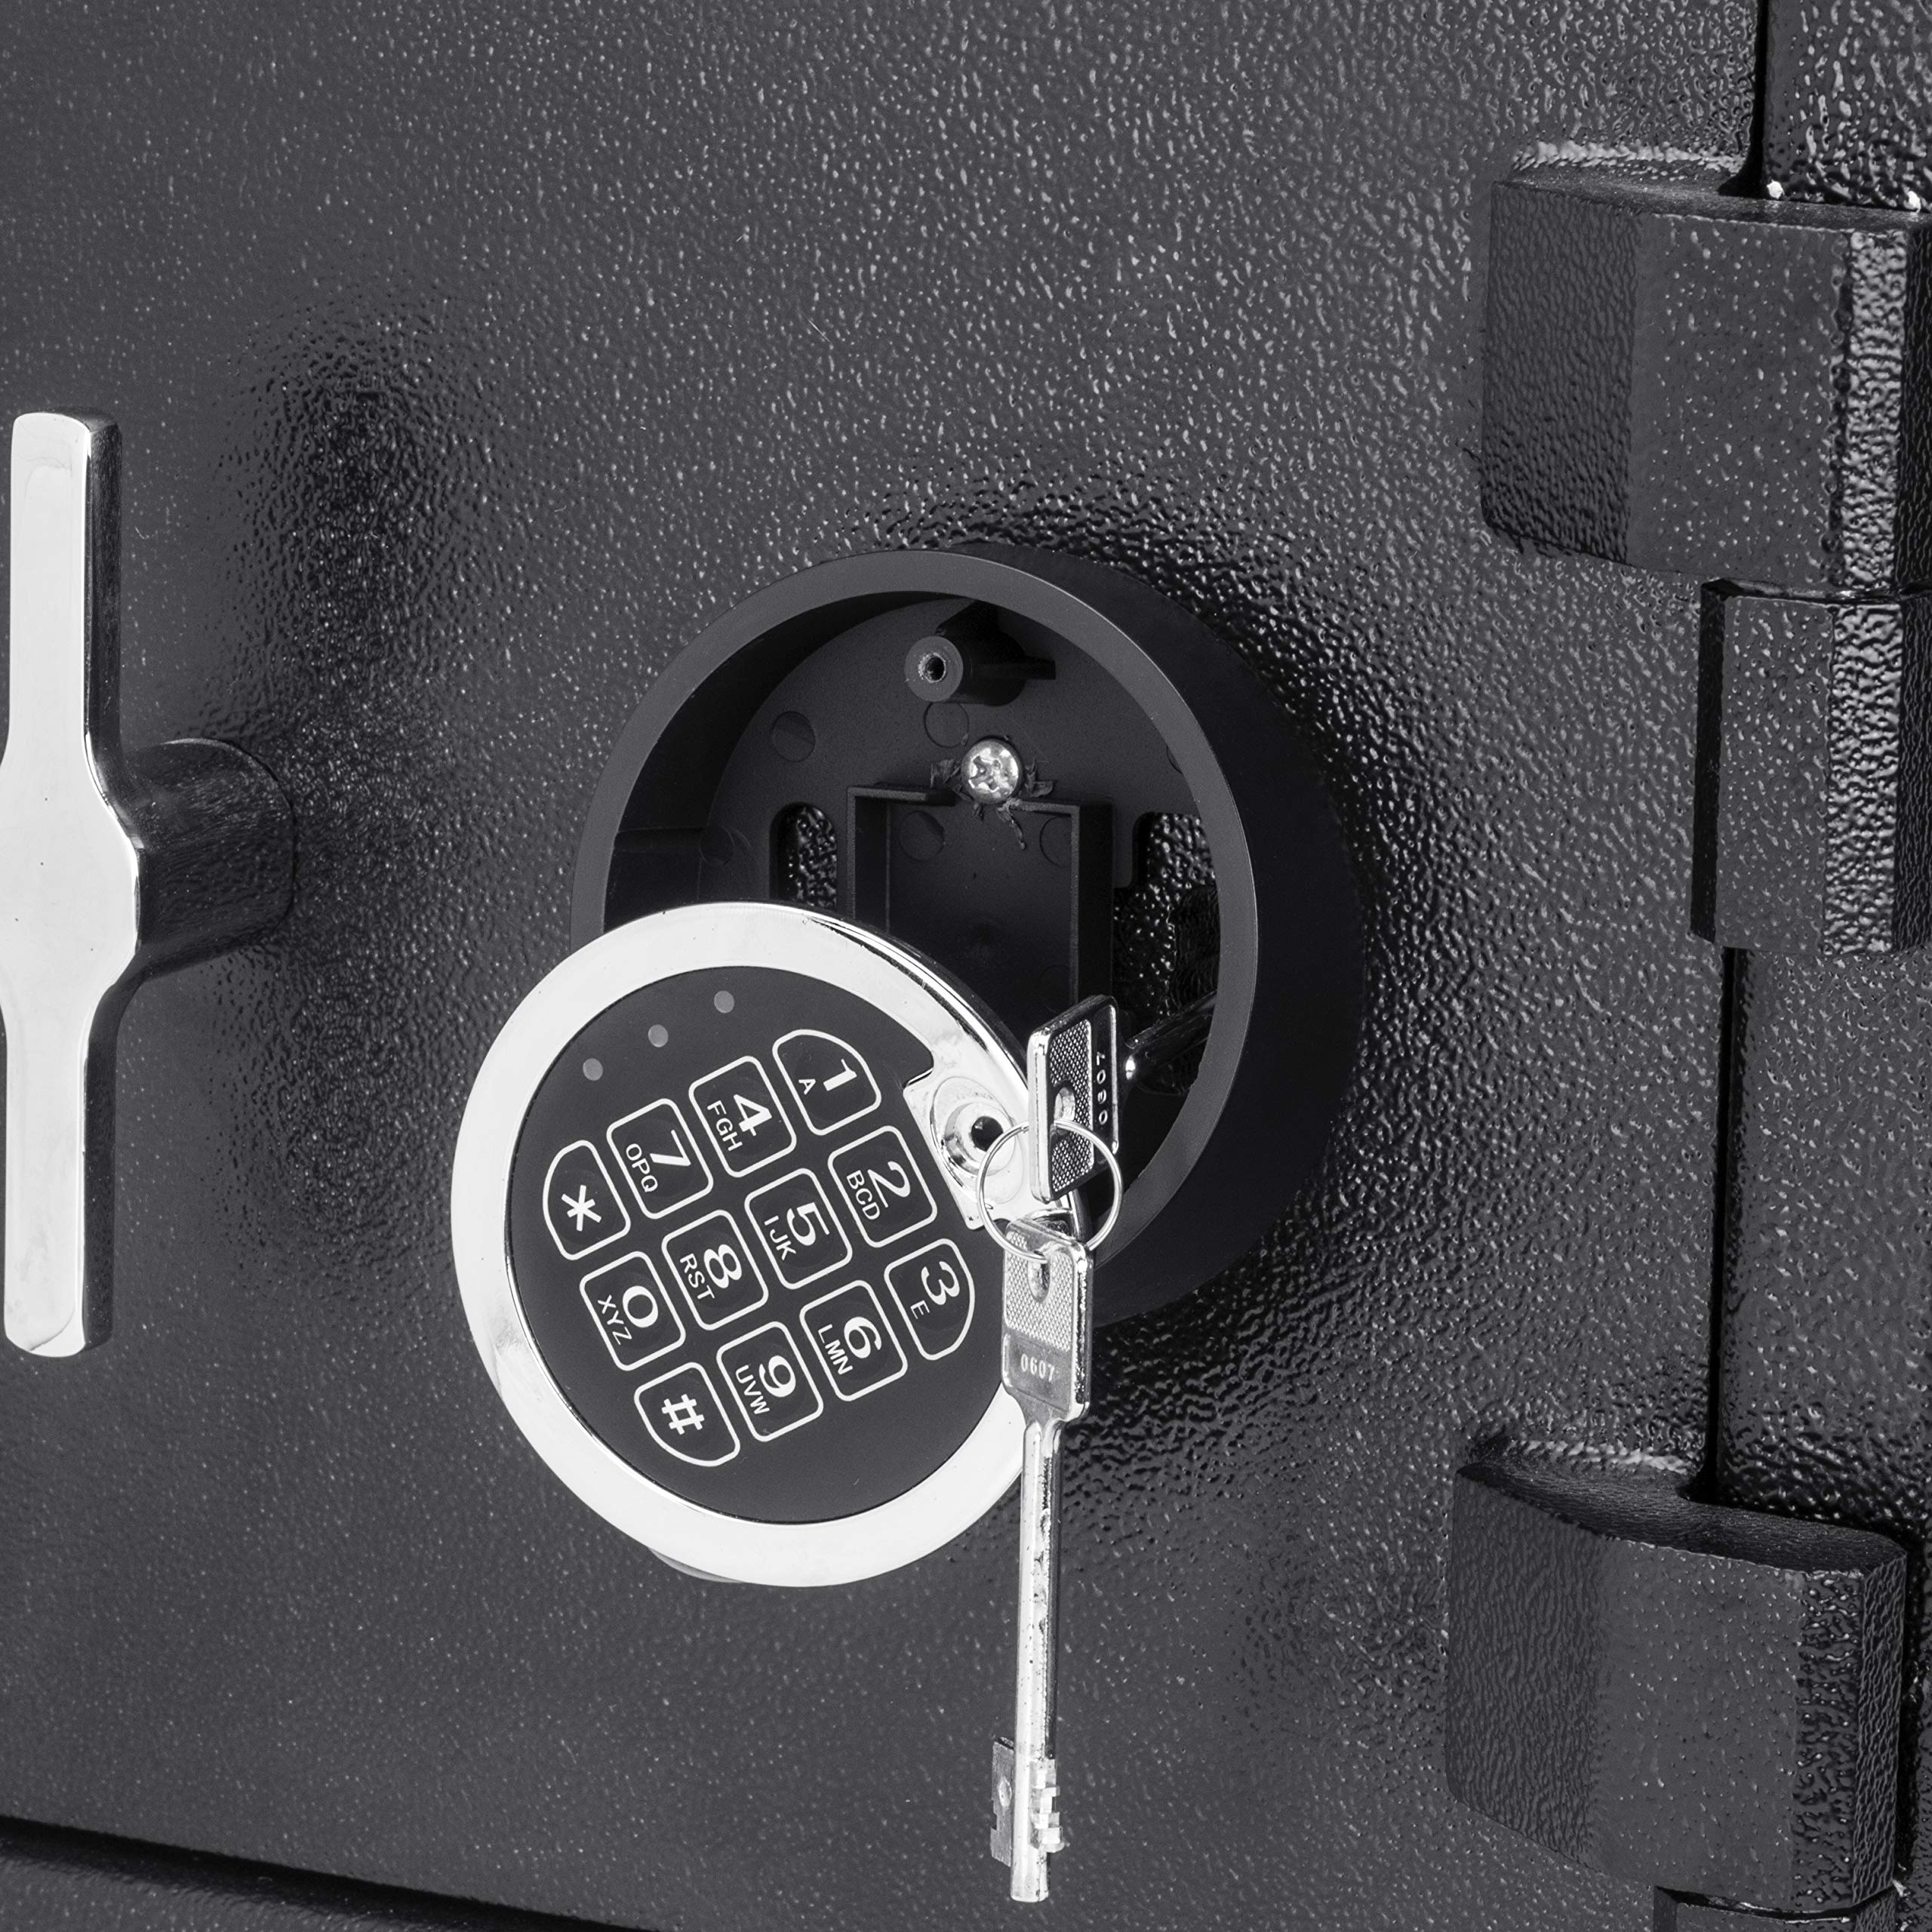 Winbest Steel Digital Keypad Cash Drop Front Loaded Depository Safe Drop Box Storage 1.12 Cubic ft by winbest (Image #3)